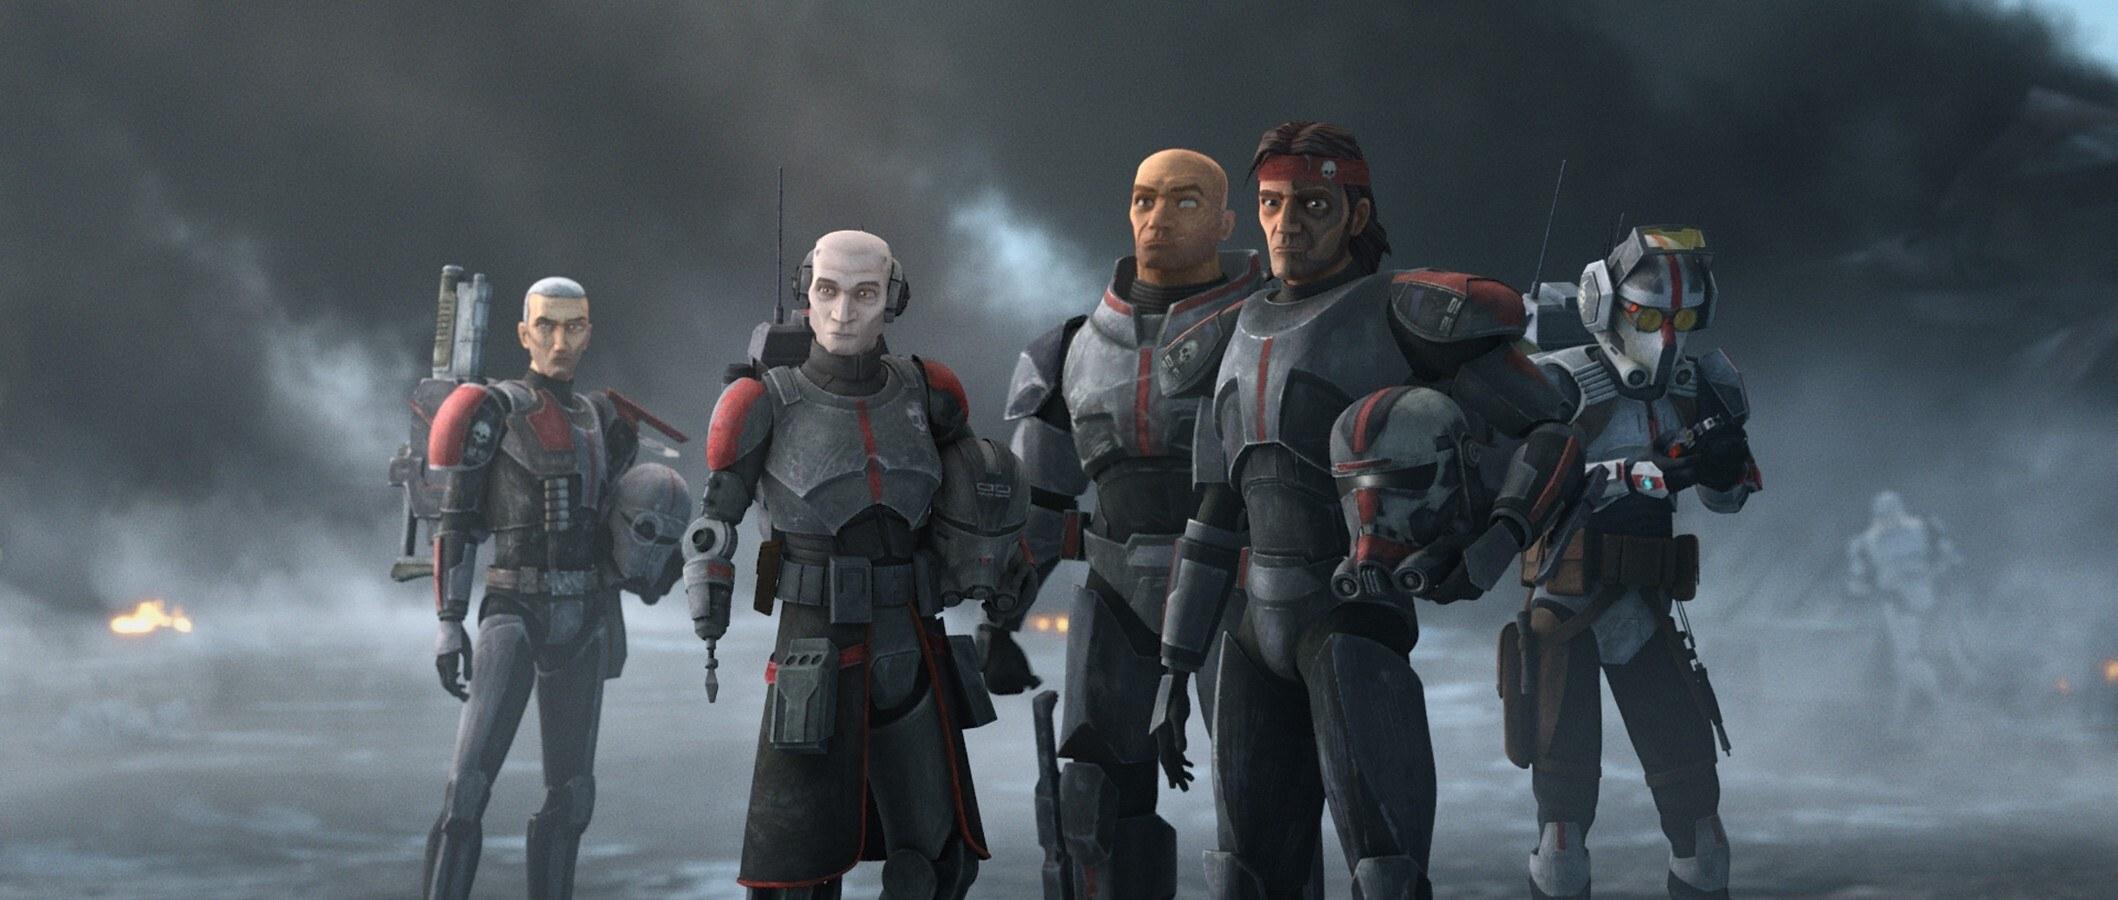 Crosshair, Echo, Wrecker, Hunter, and Teck stand in a smokey plain